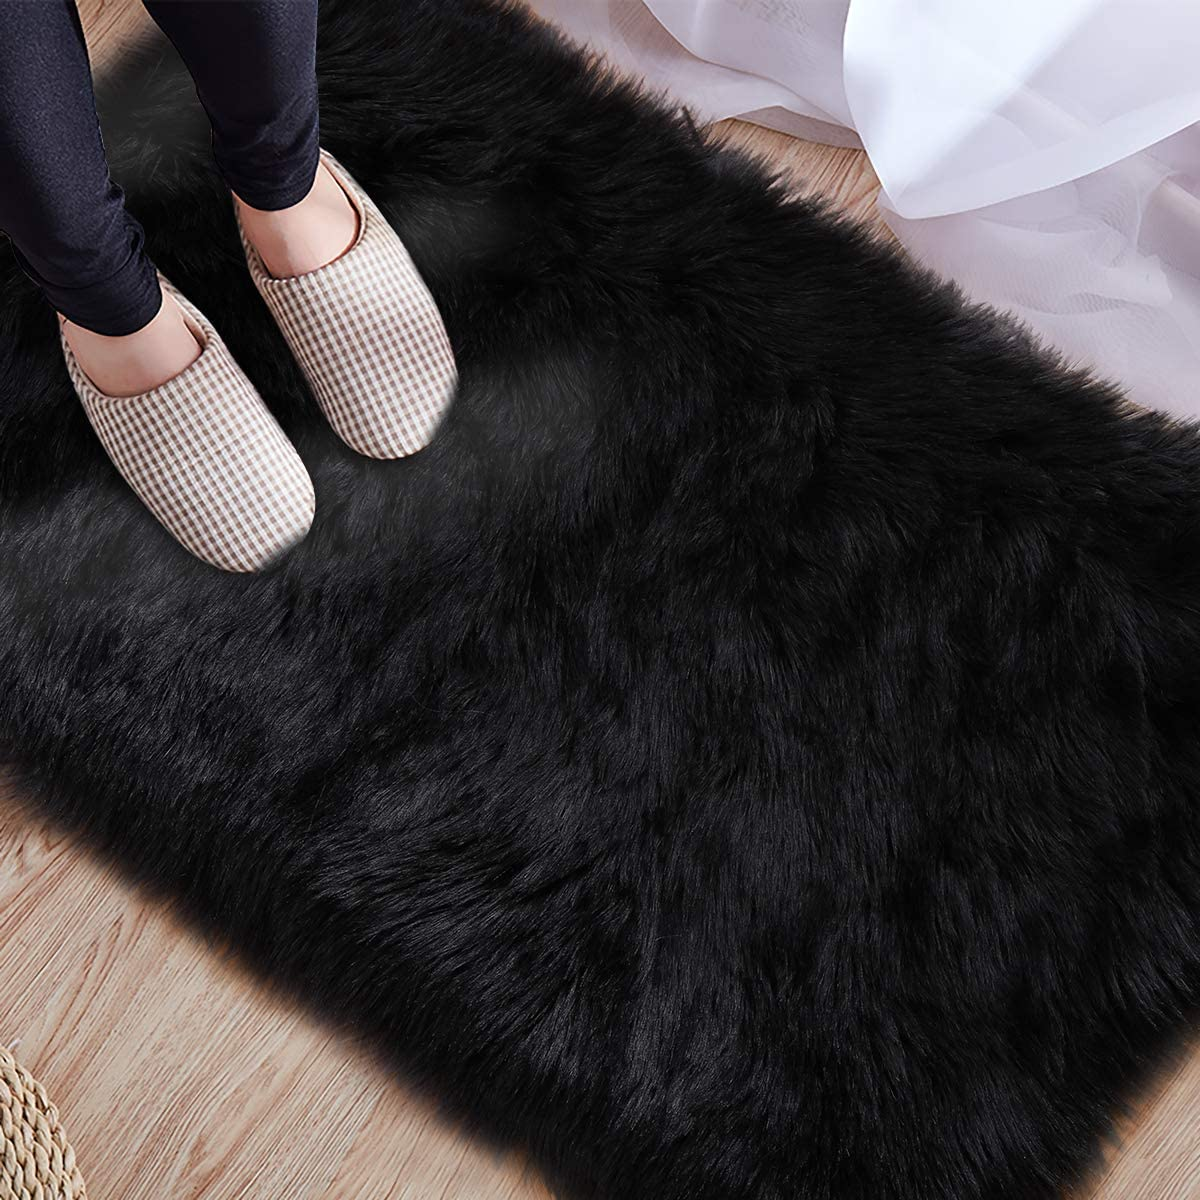 2x3 Feet Light Blue LOCHAS Ultra Soft Fluffy Rugs Faux Fur Sheepskin Area Rug for Bedroom Bedside Living Room Carpet Nursery Washable Floor Mat